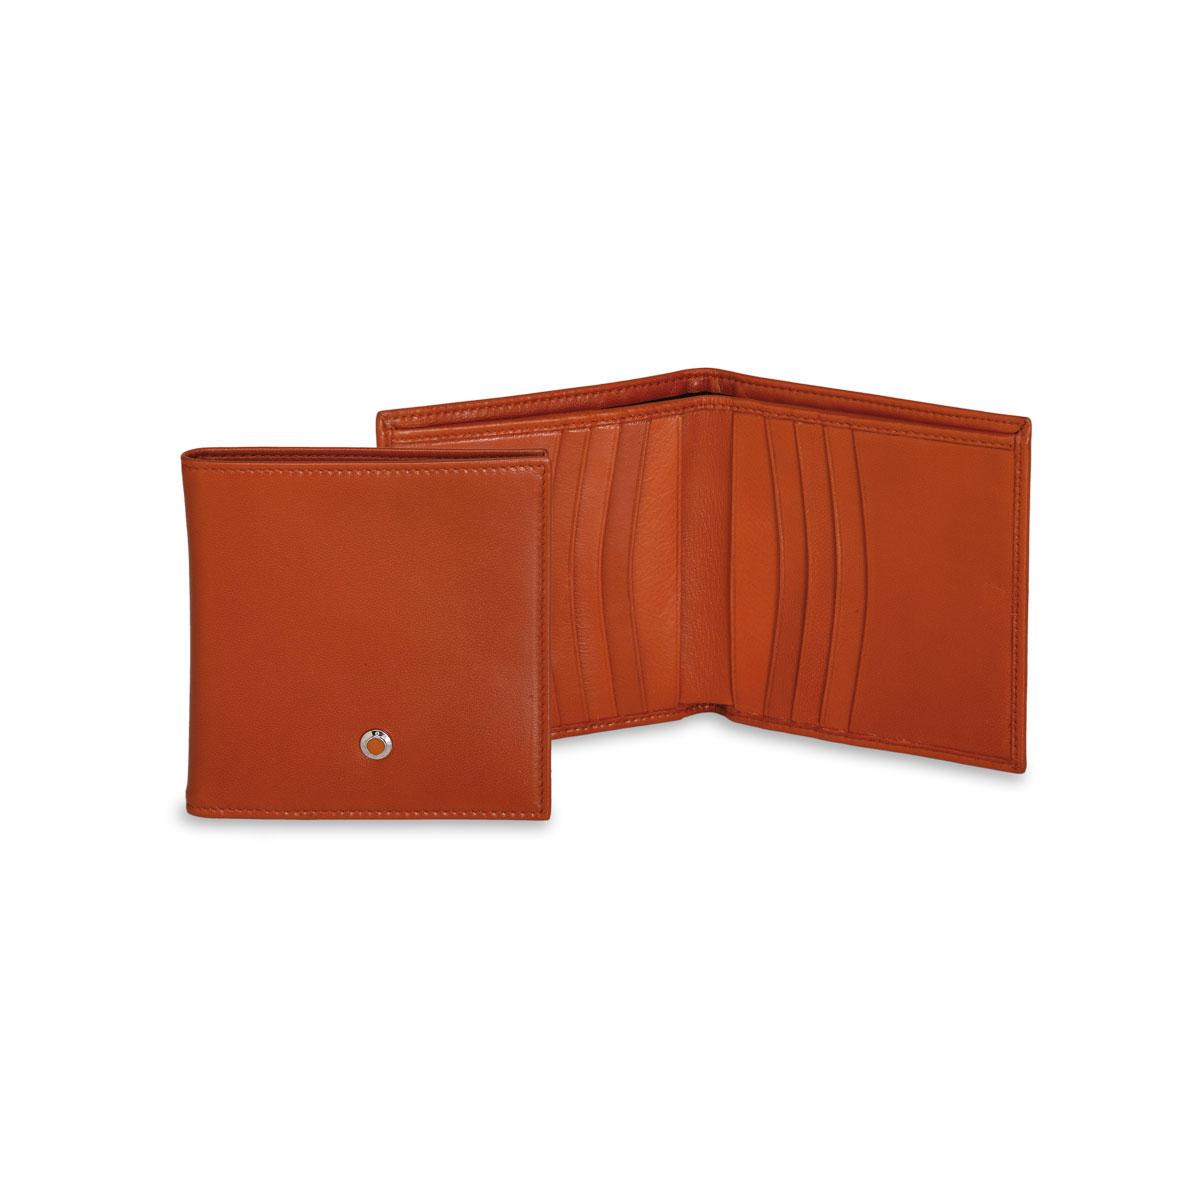 a4ad2899b693ec Add to My Lists. Underwood Italian Leather Men's Small Bifold Credit Card  Wallet